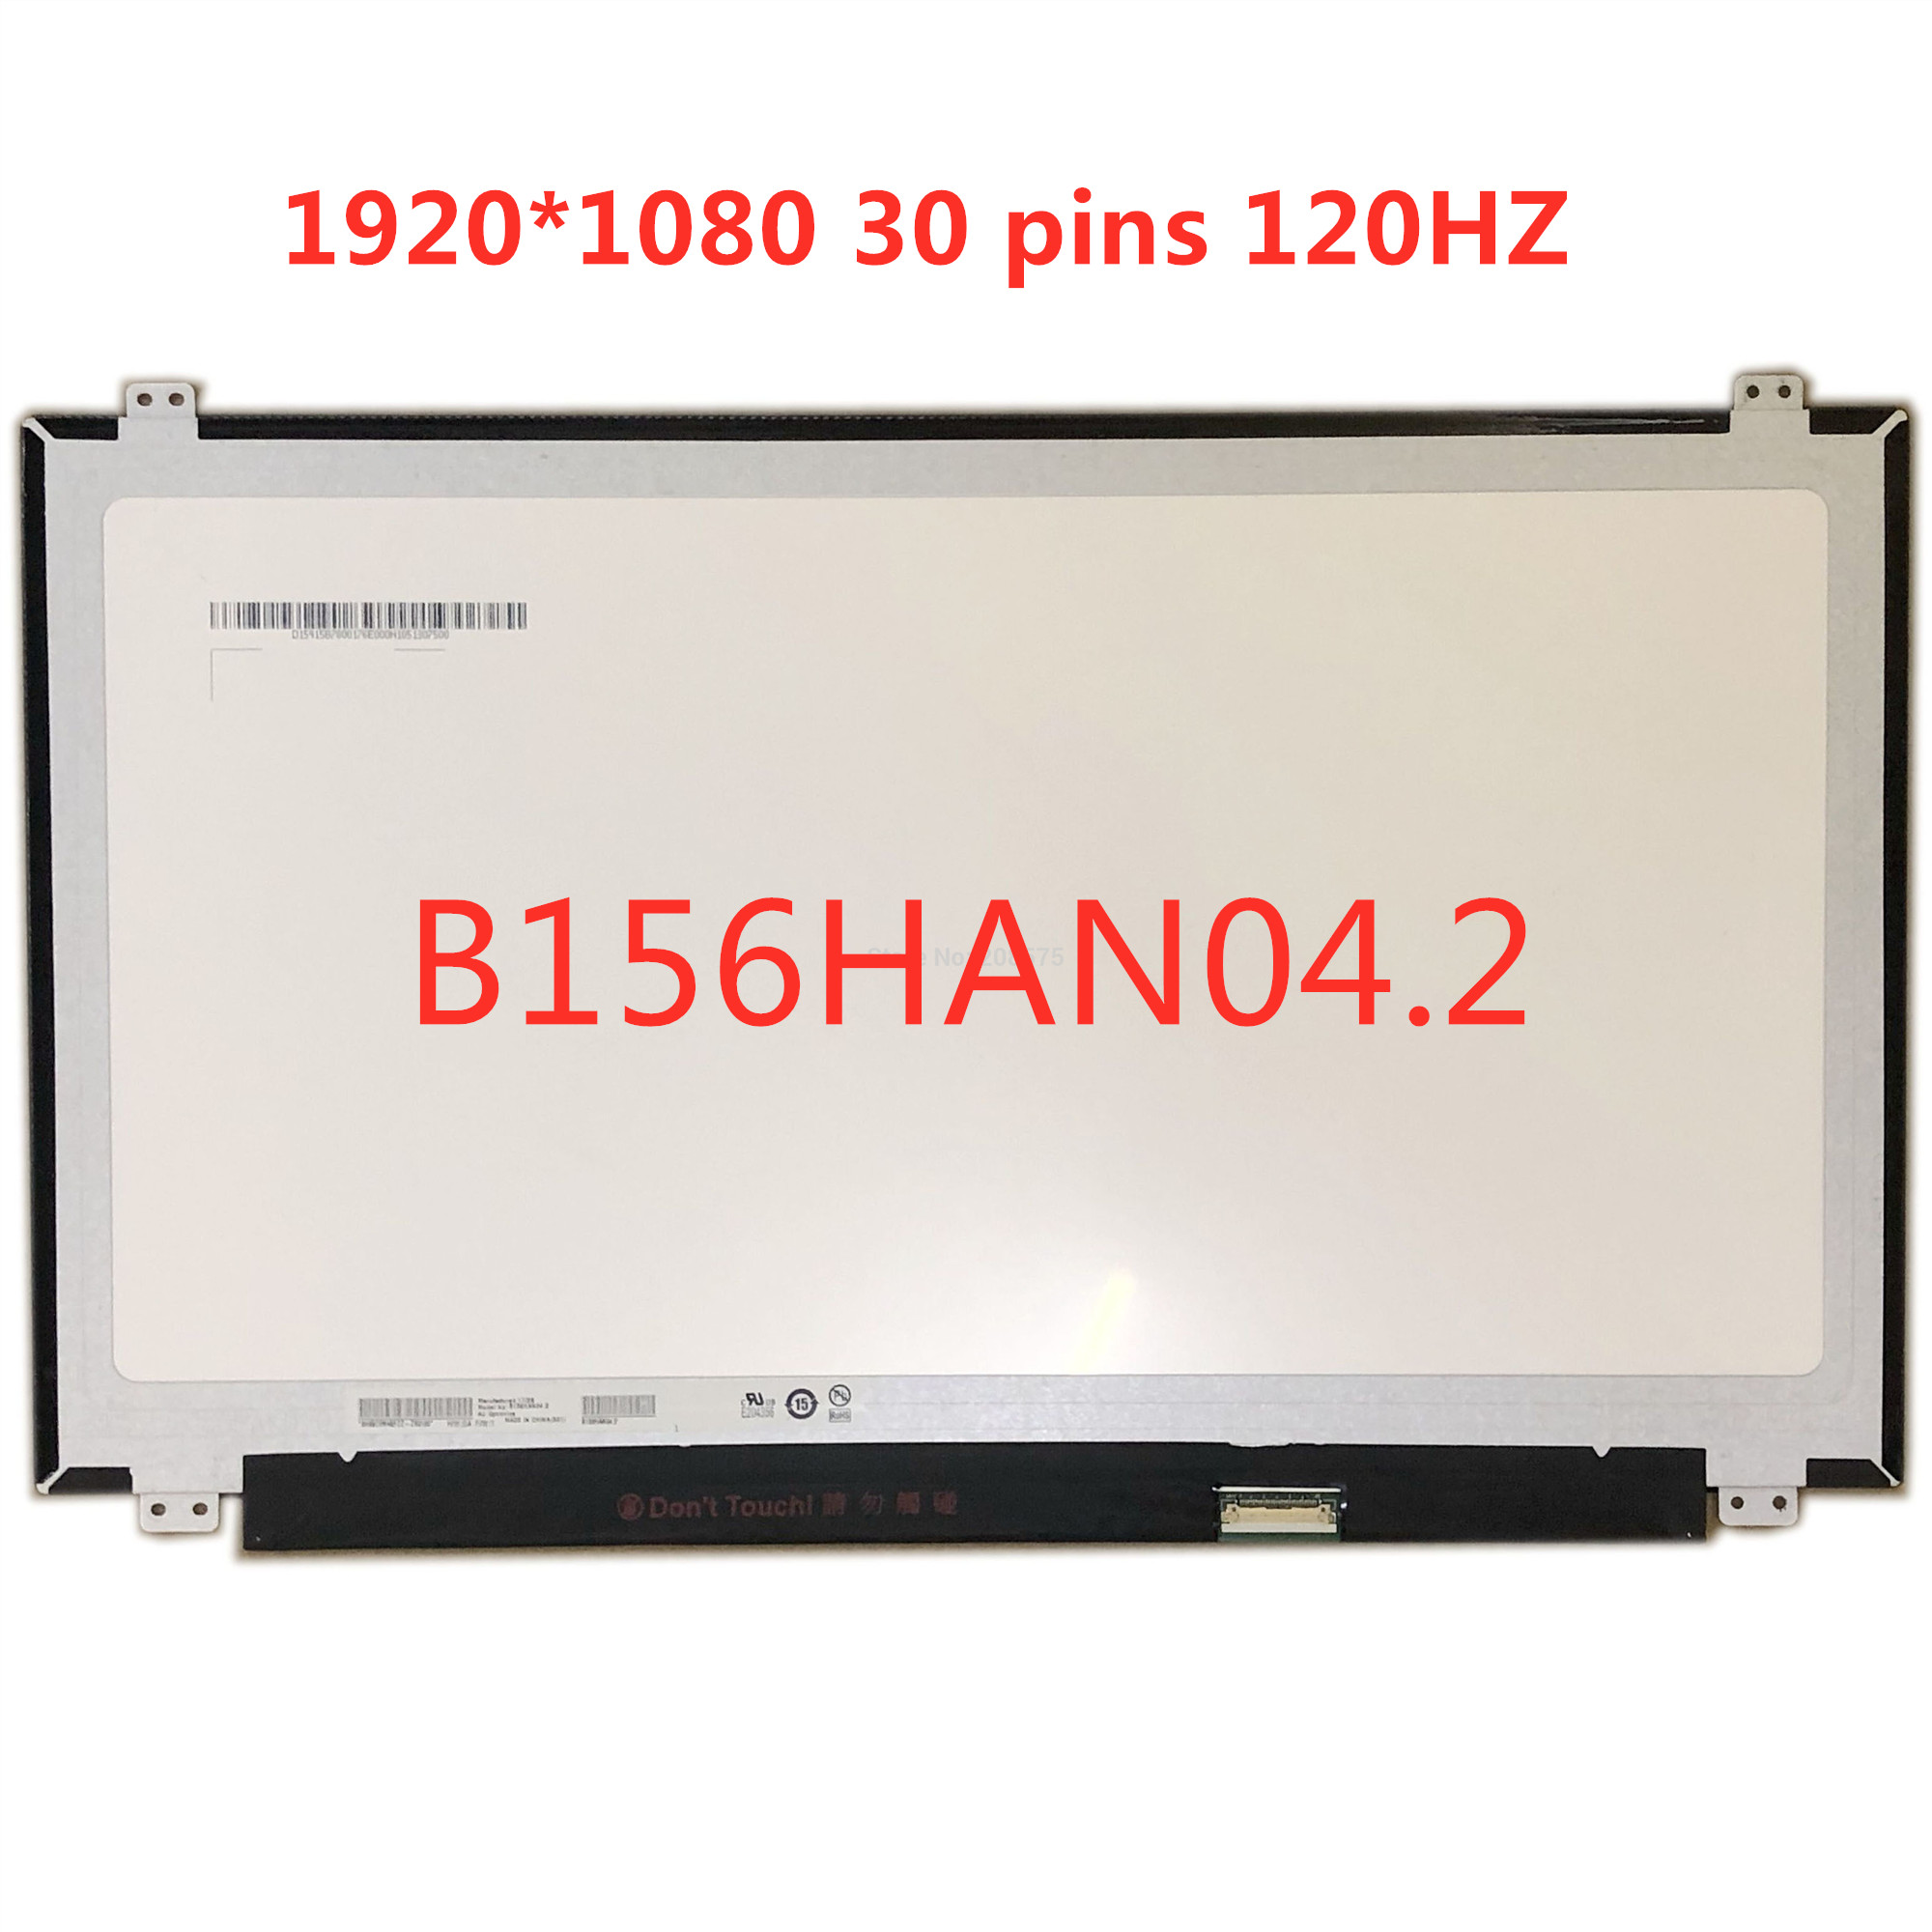 "B156HAN04.2 B156HAN04.2 IPS светодиодный экран 120 Гц ЖК матрица для ноутбука 15,6 ""матовая 1920X1080 FHD 30Pin eDP 120 Гц дисплей|ЖК-экран для ноутбуков|   | АлиЭкспресс"